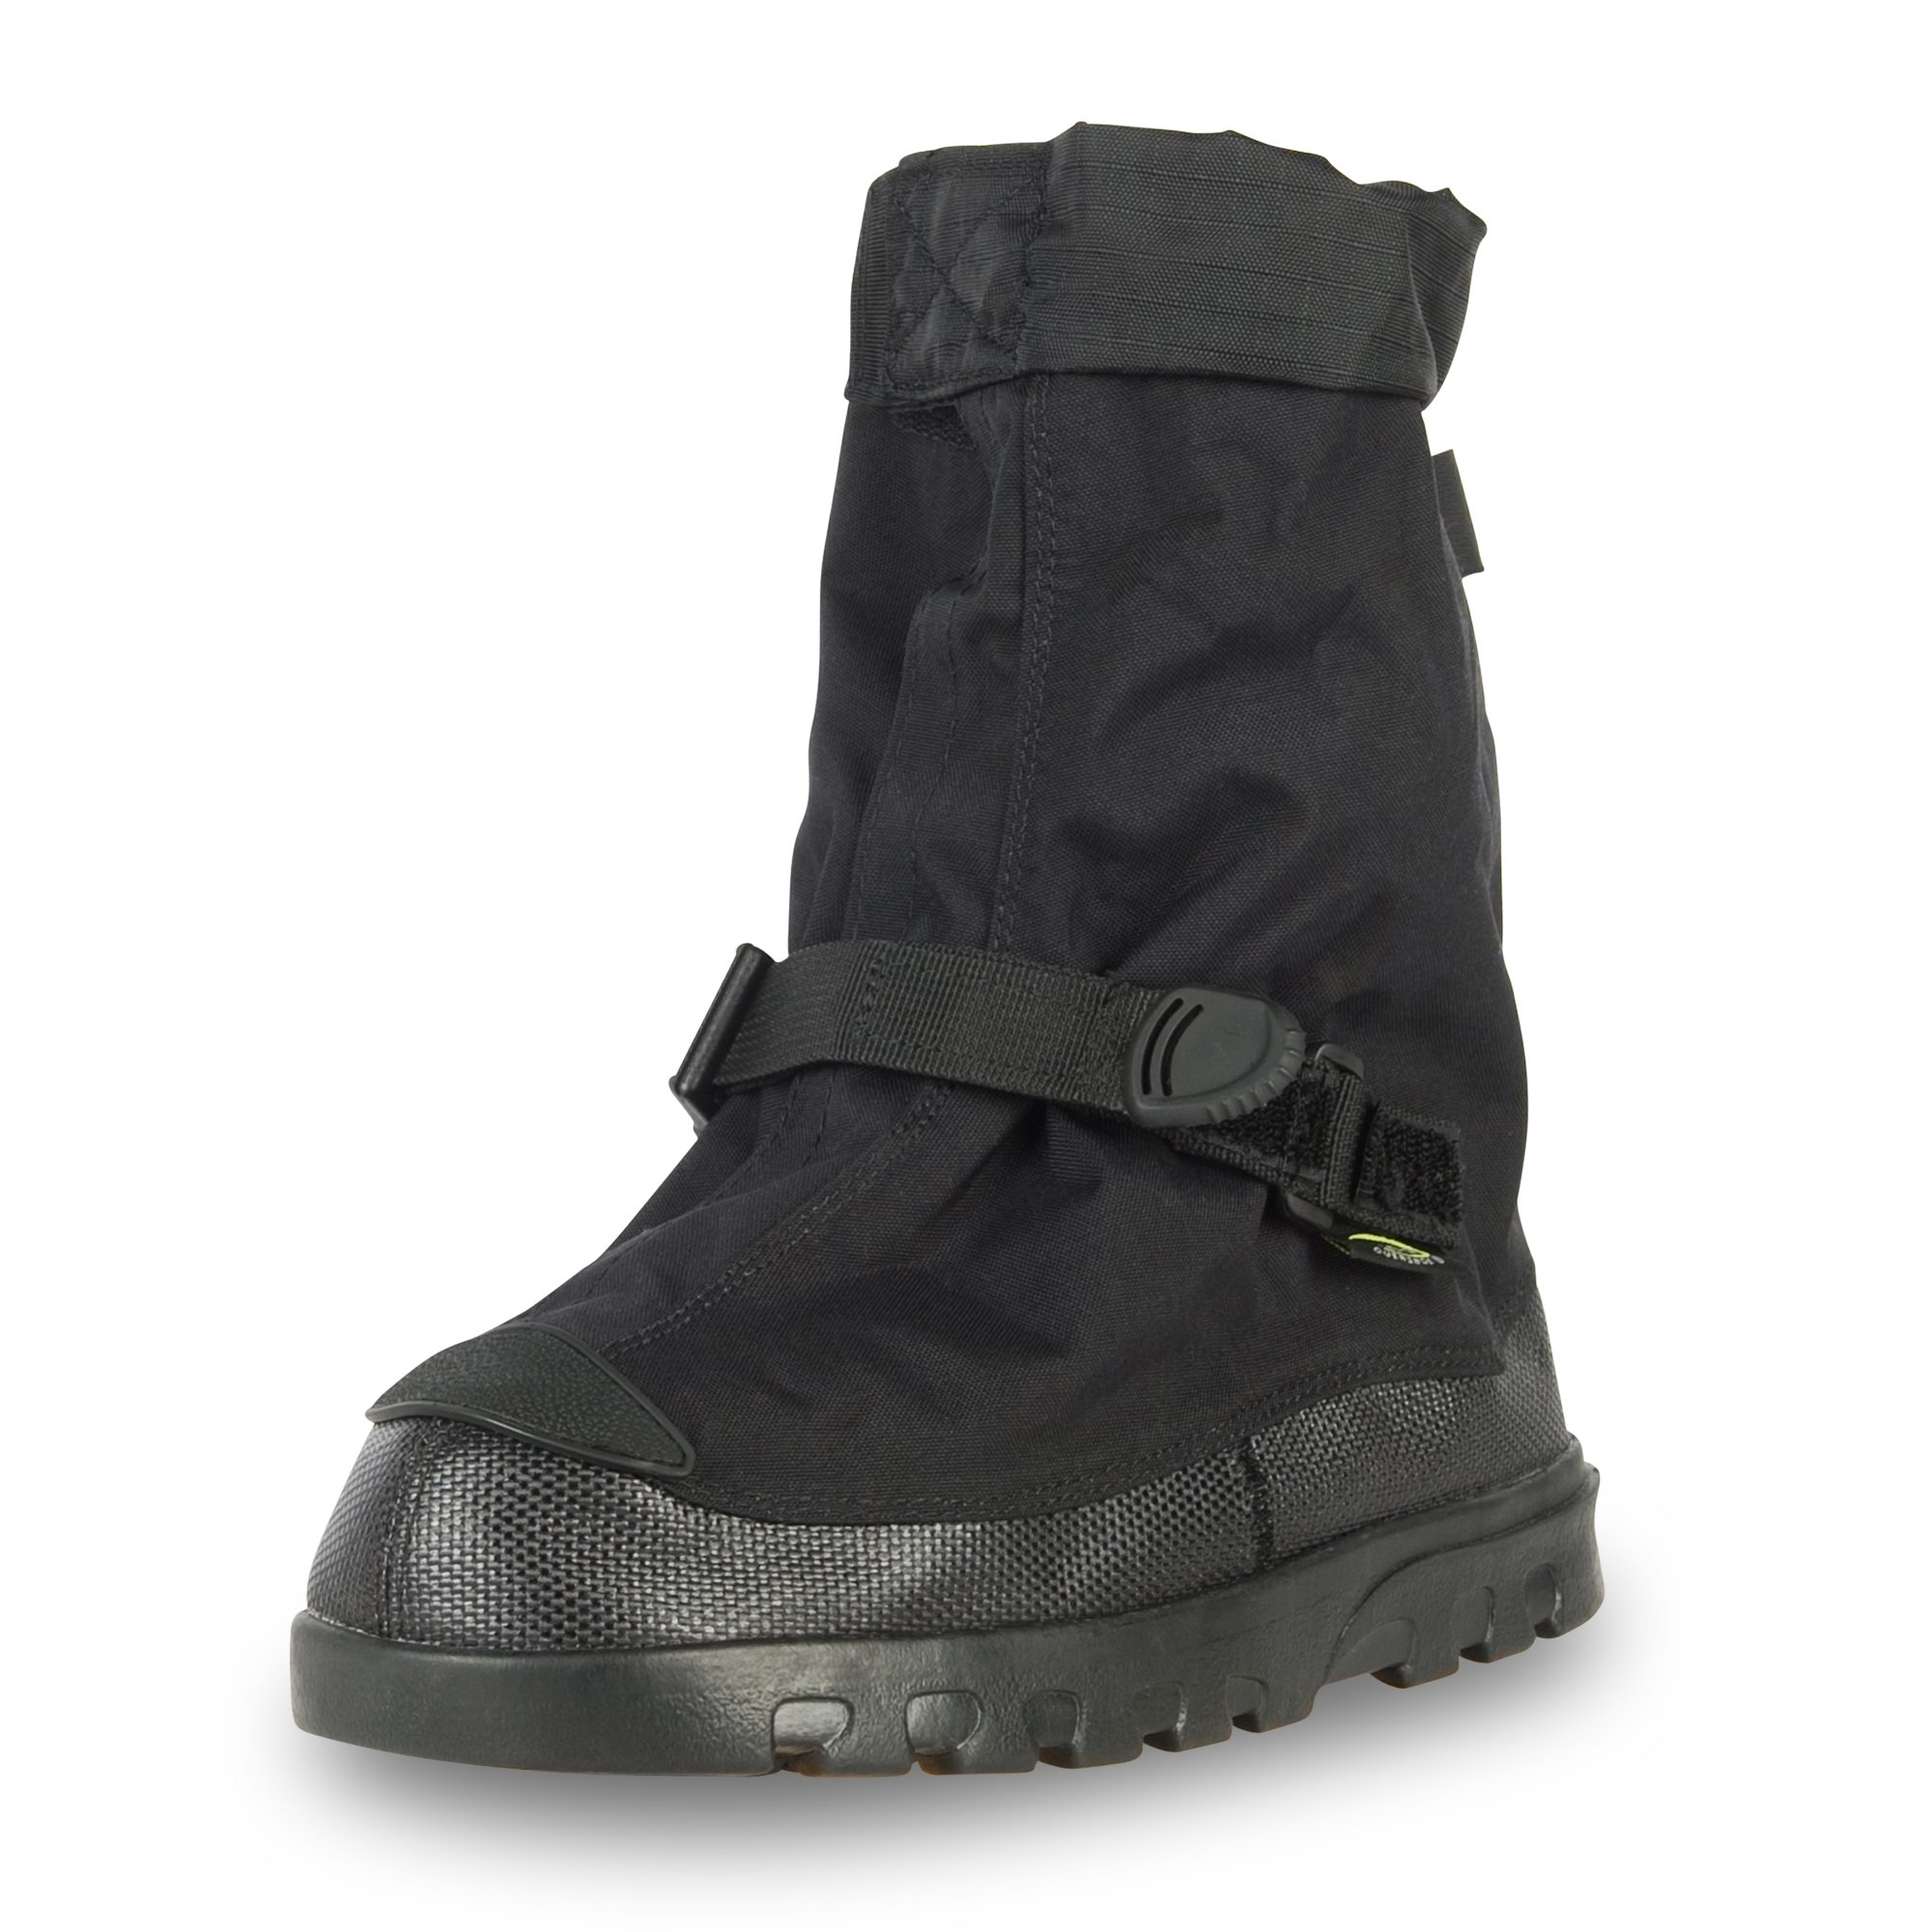 NEOS 10'' Voyager Nylon All Season Waterproof Overshoes (VNN1) by NEOS Overshoe (Image #1)